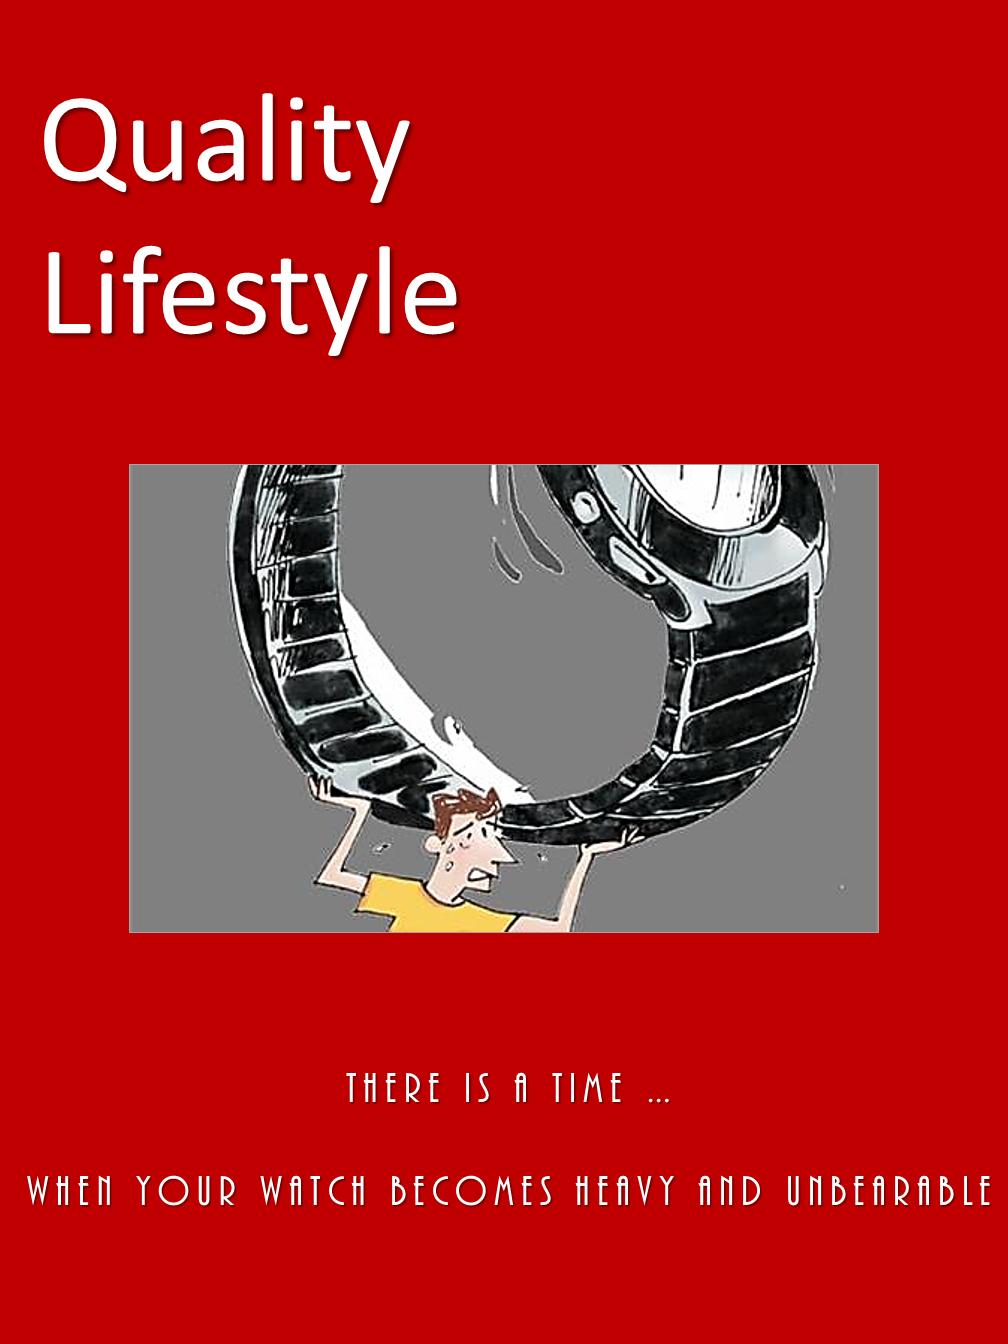 Quality Lifestyle